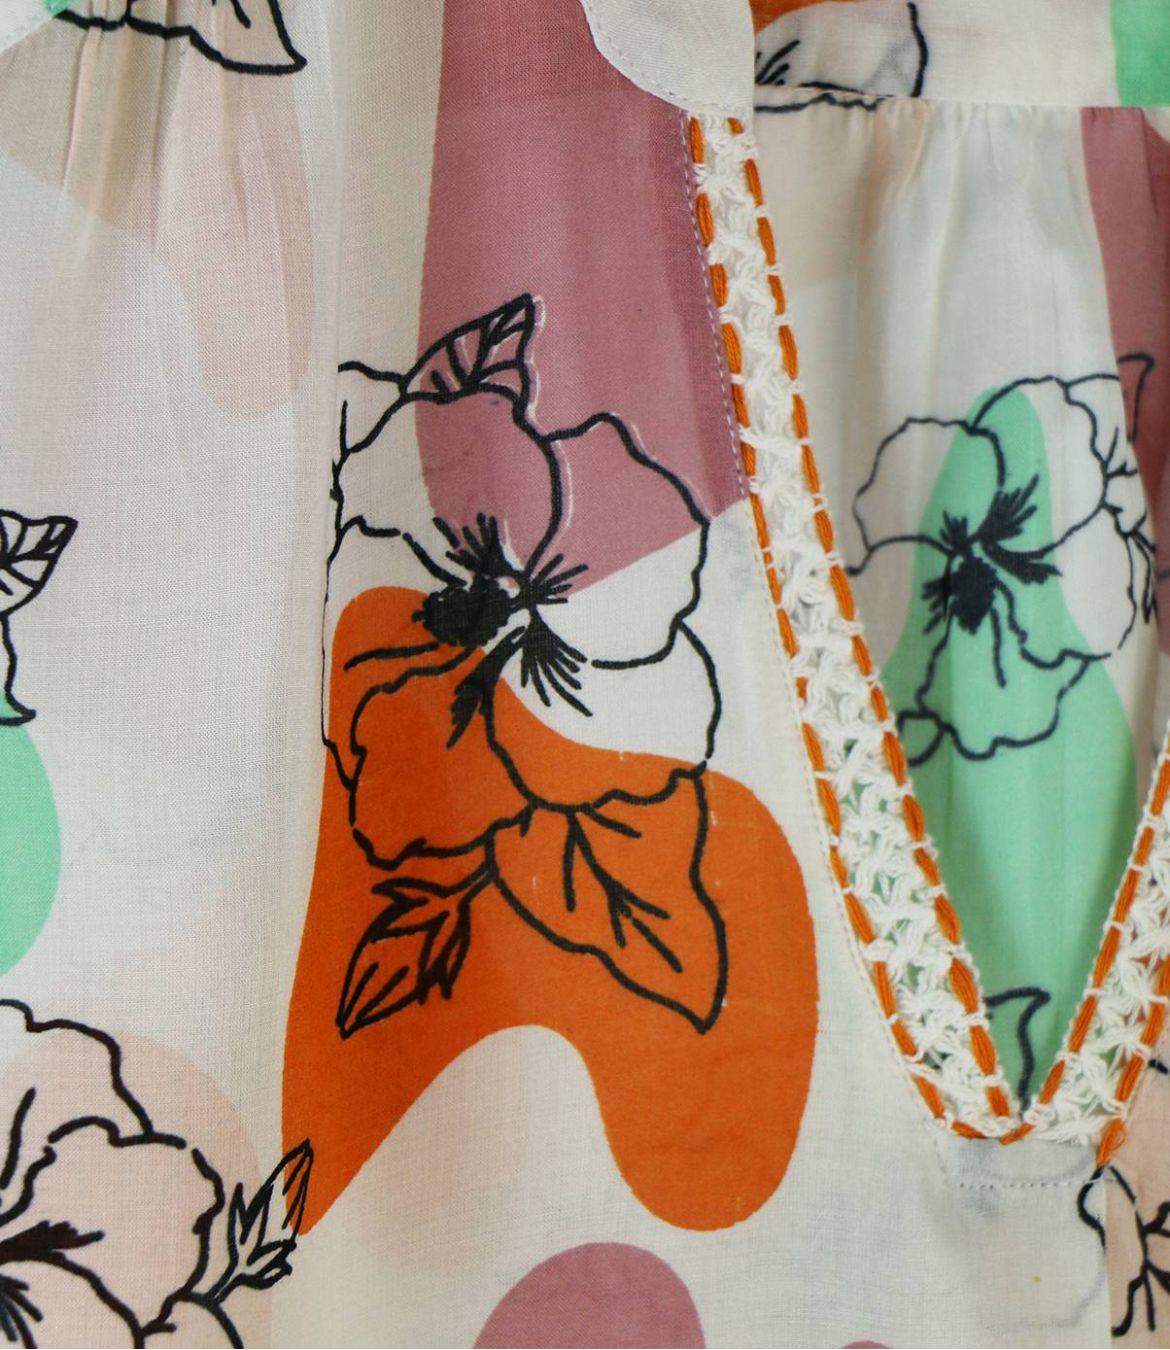 ZOE VANYA Women's Modal T-shirt Storiatipic - 3